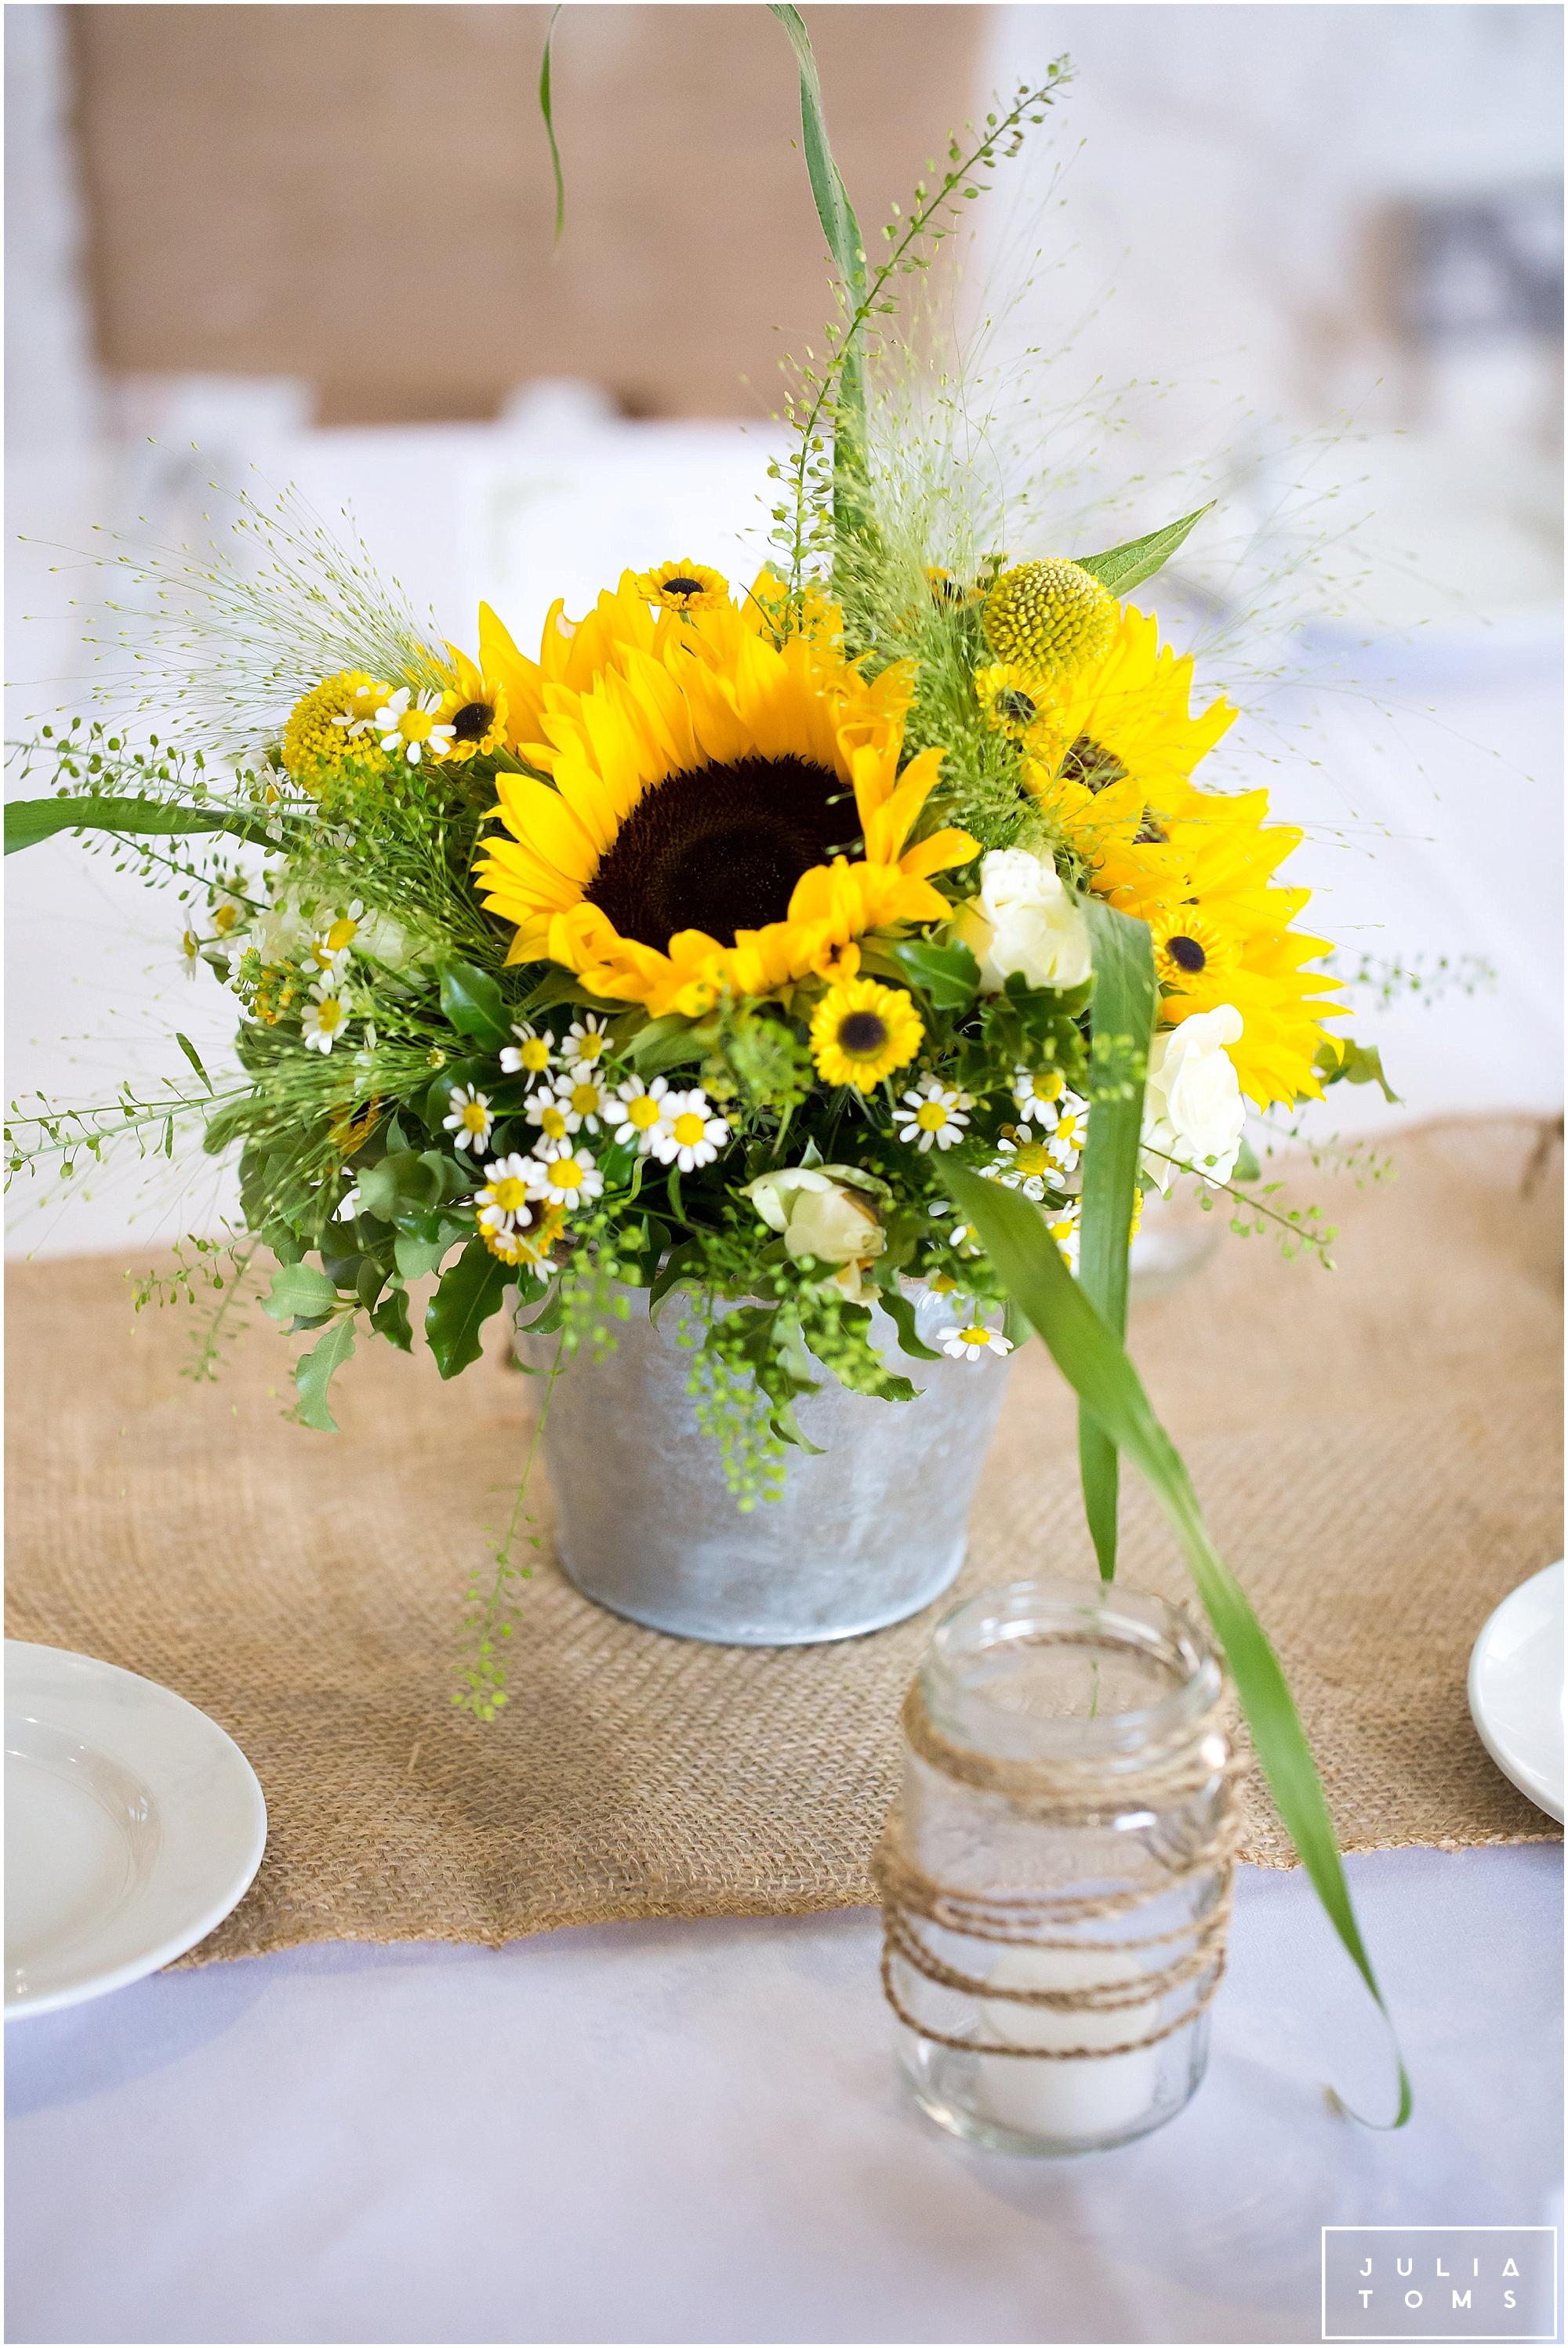 julia_toms_chichester_wedding_photographer_worthing_071.jpg